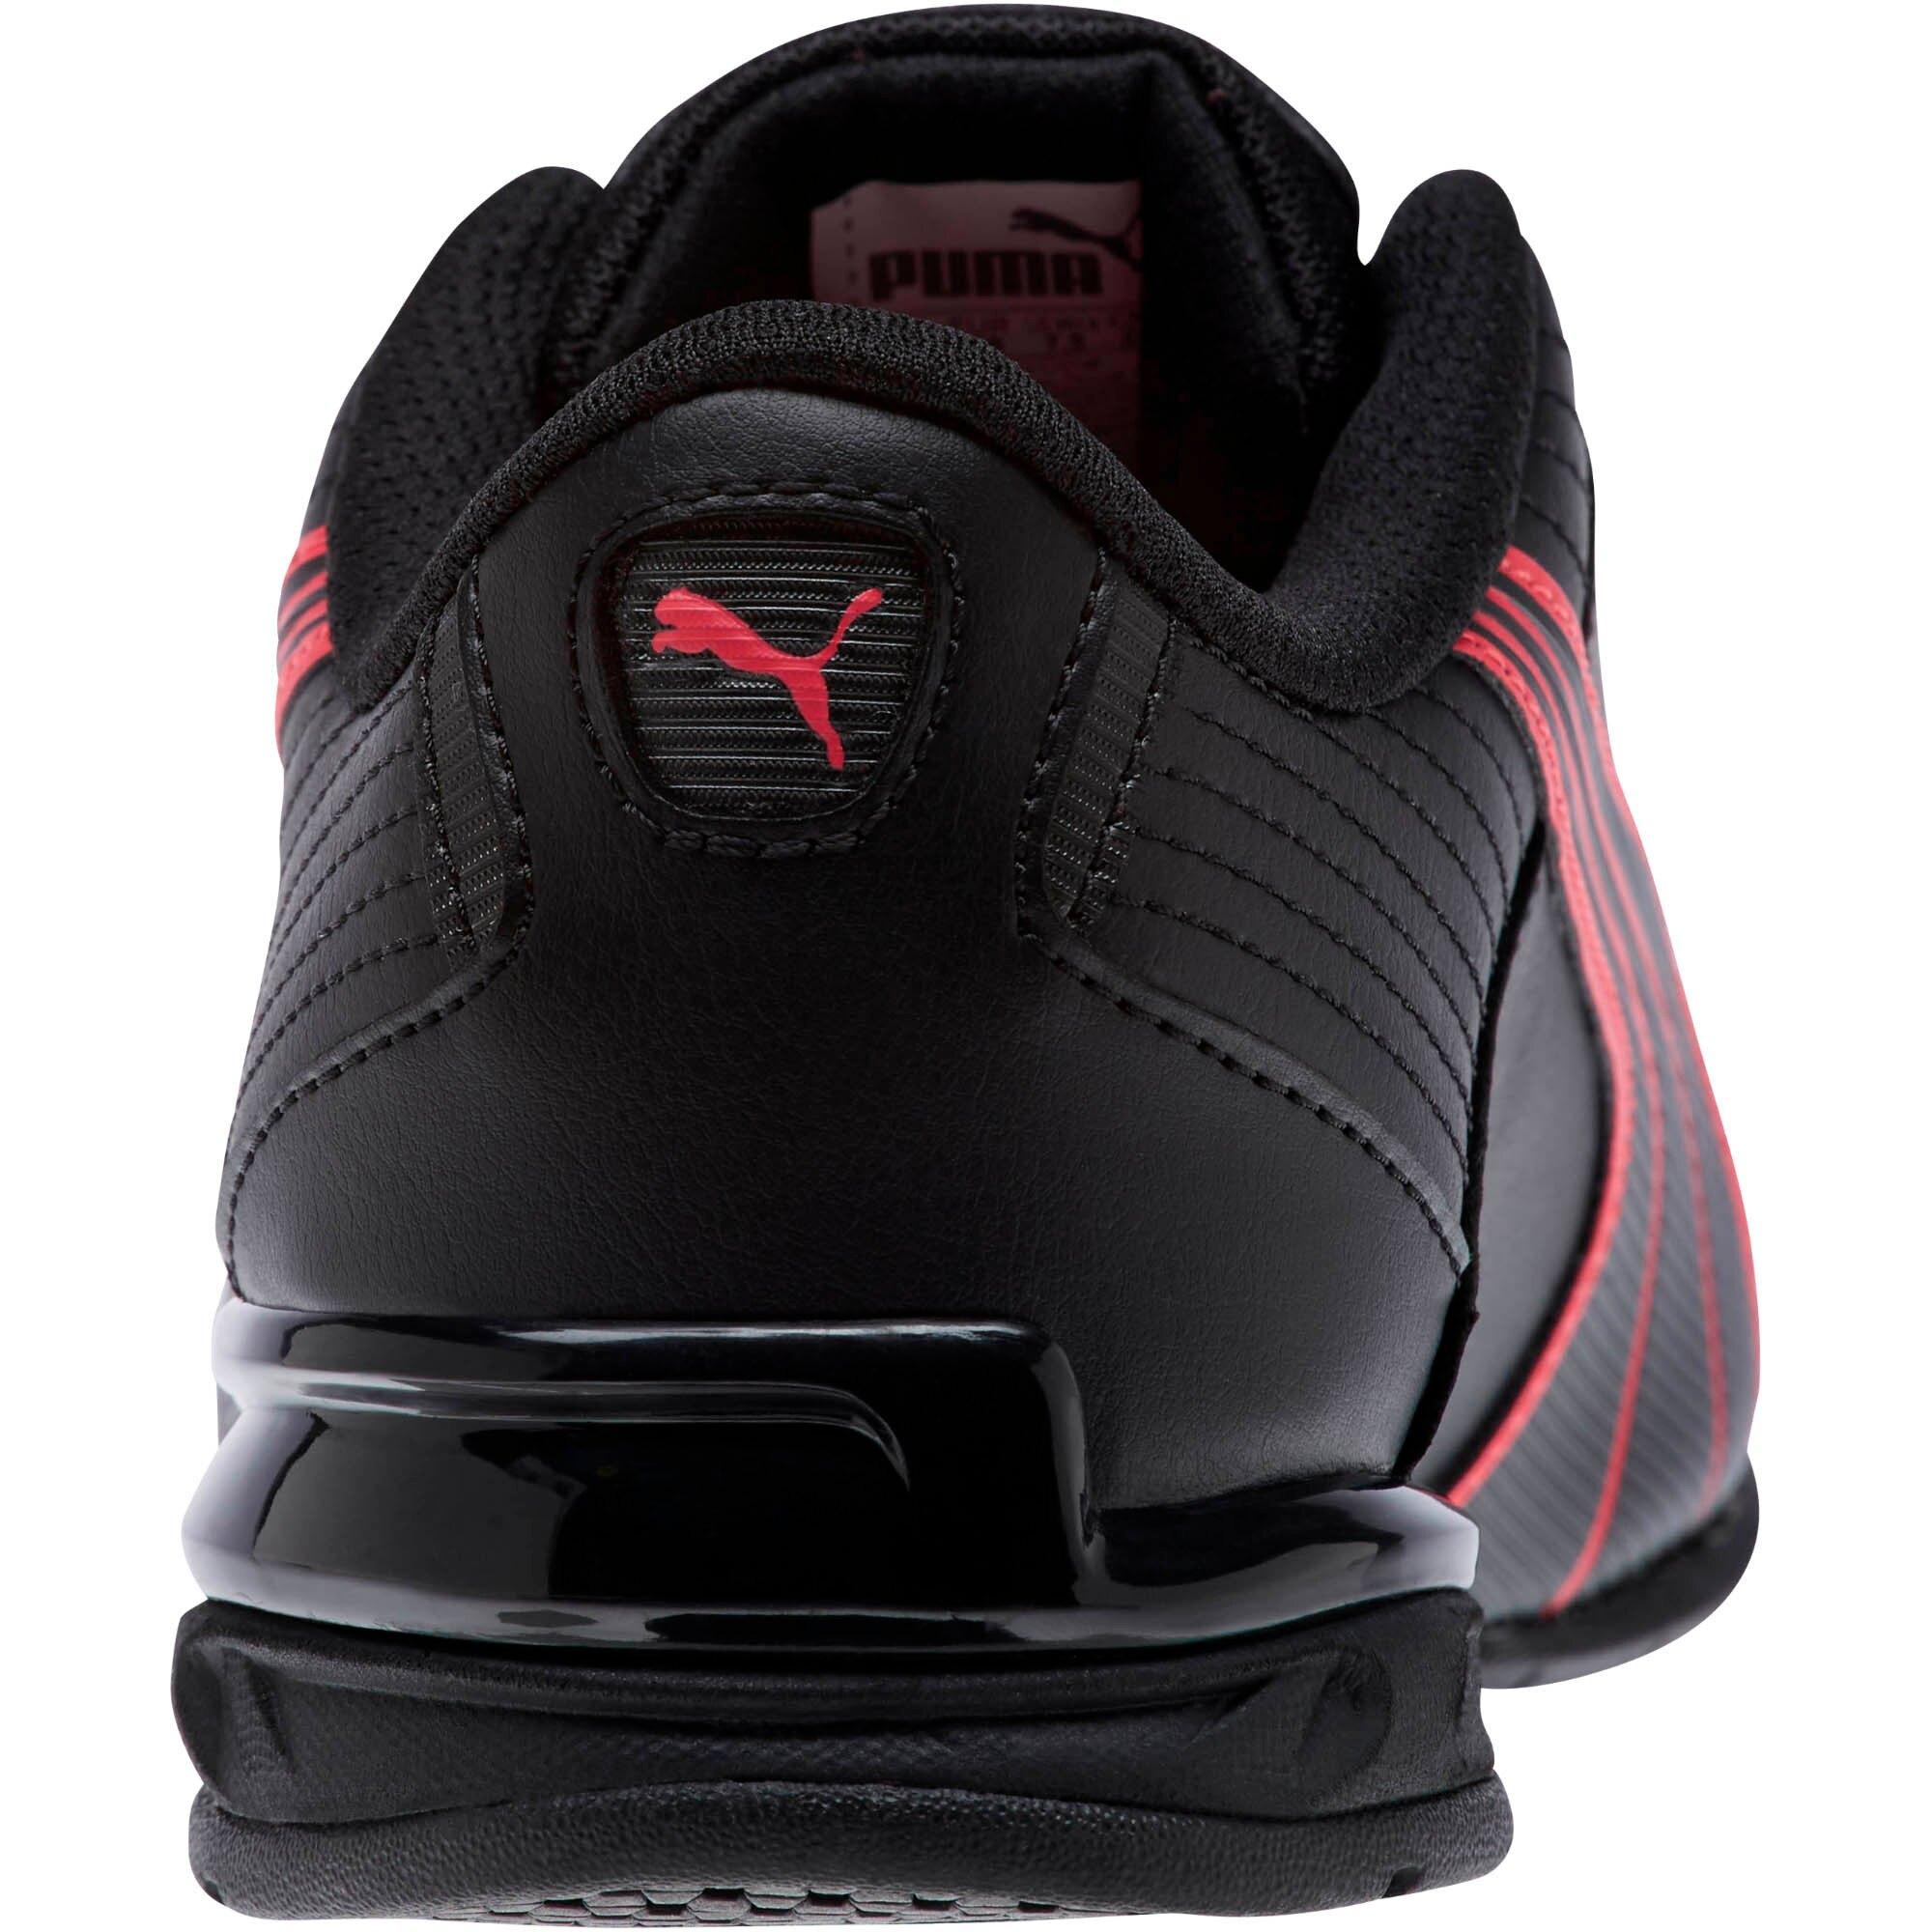 29076a4a2ef2 Official Puma Store  PUMA Super Elevate Women s Training Shoes ...